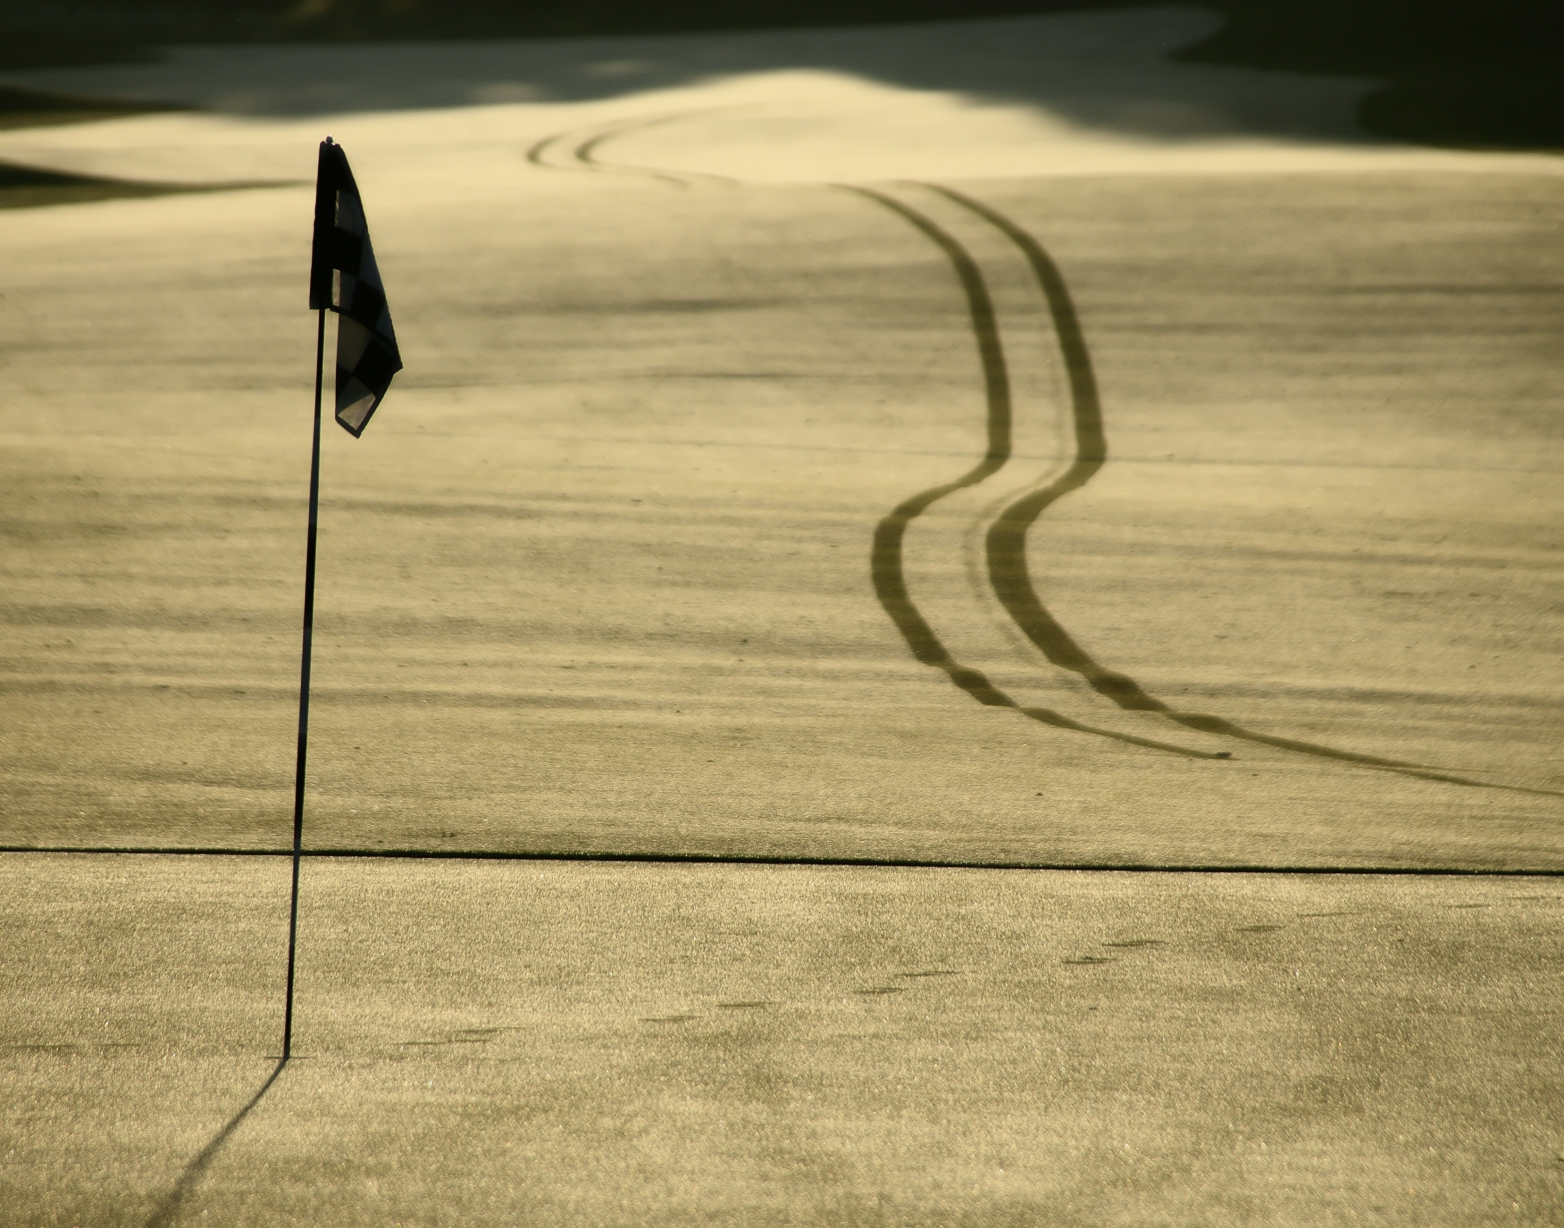 golf hole long shot